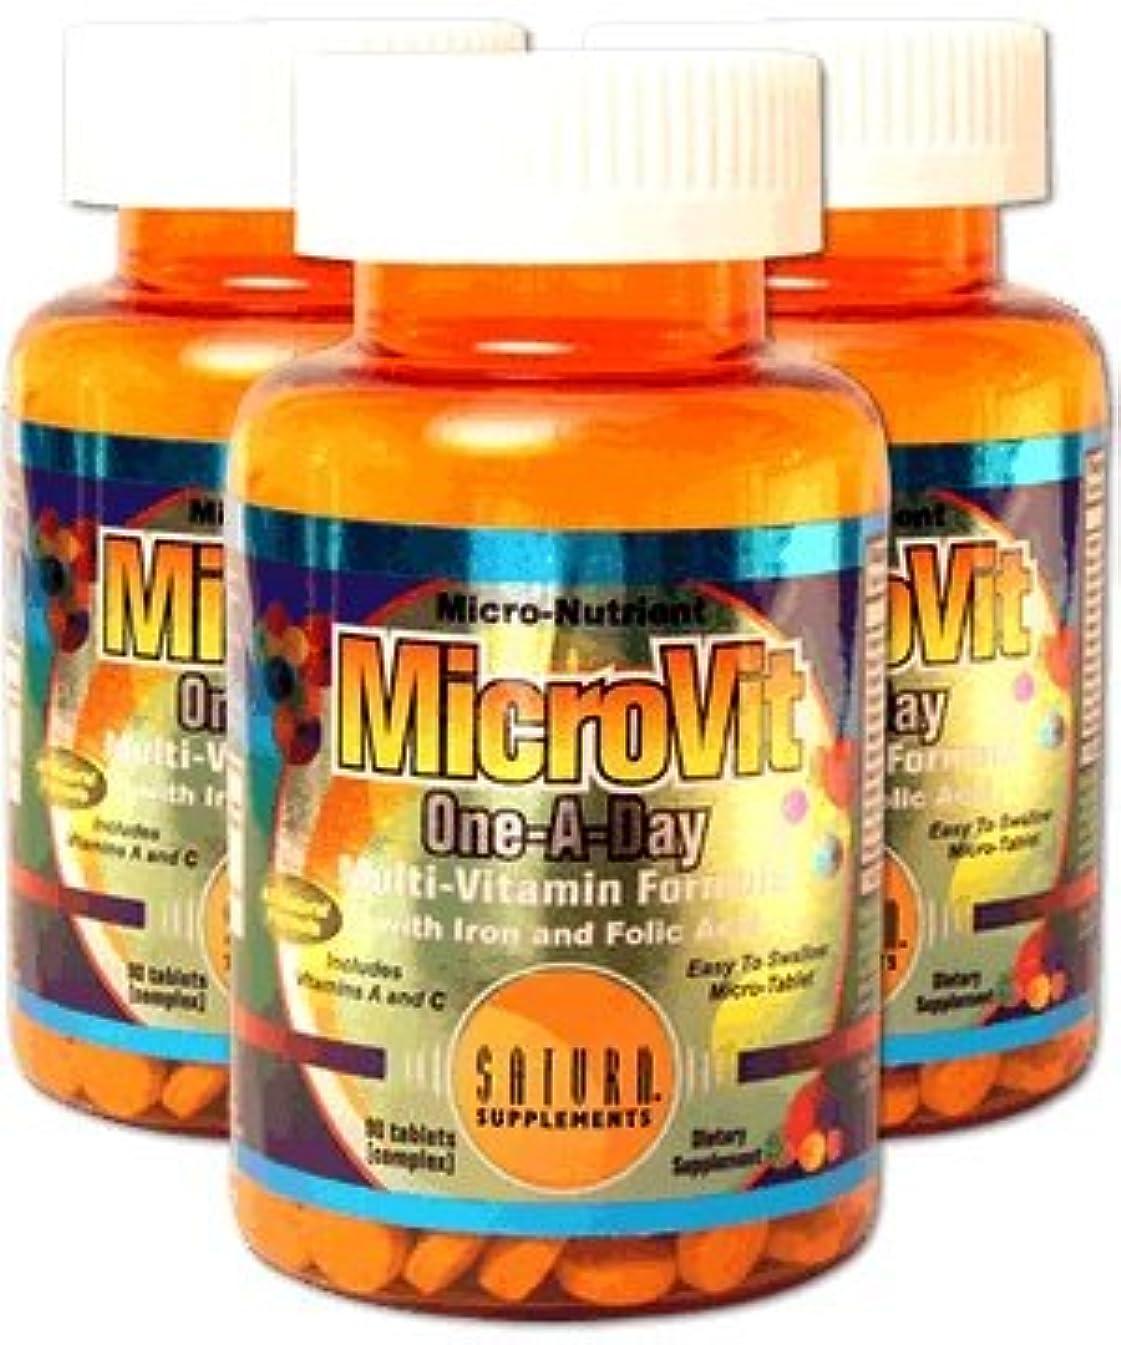 Micro Vit/90Tablets2 Bottles Set_ 2本セット 【サターンサプリメント?メーカー/アメリカから直接発送】 マイクロビット 90錠